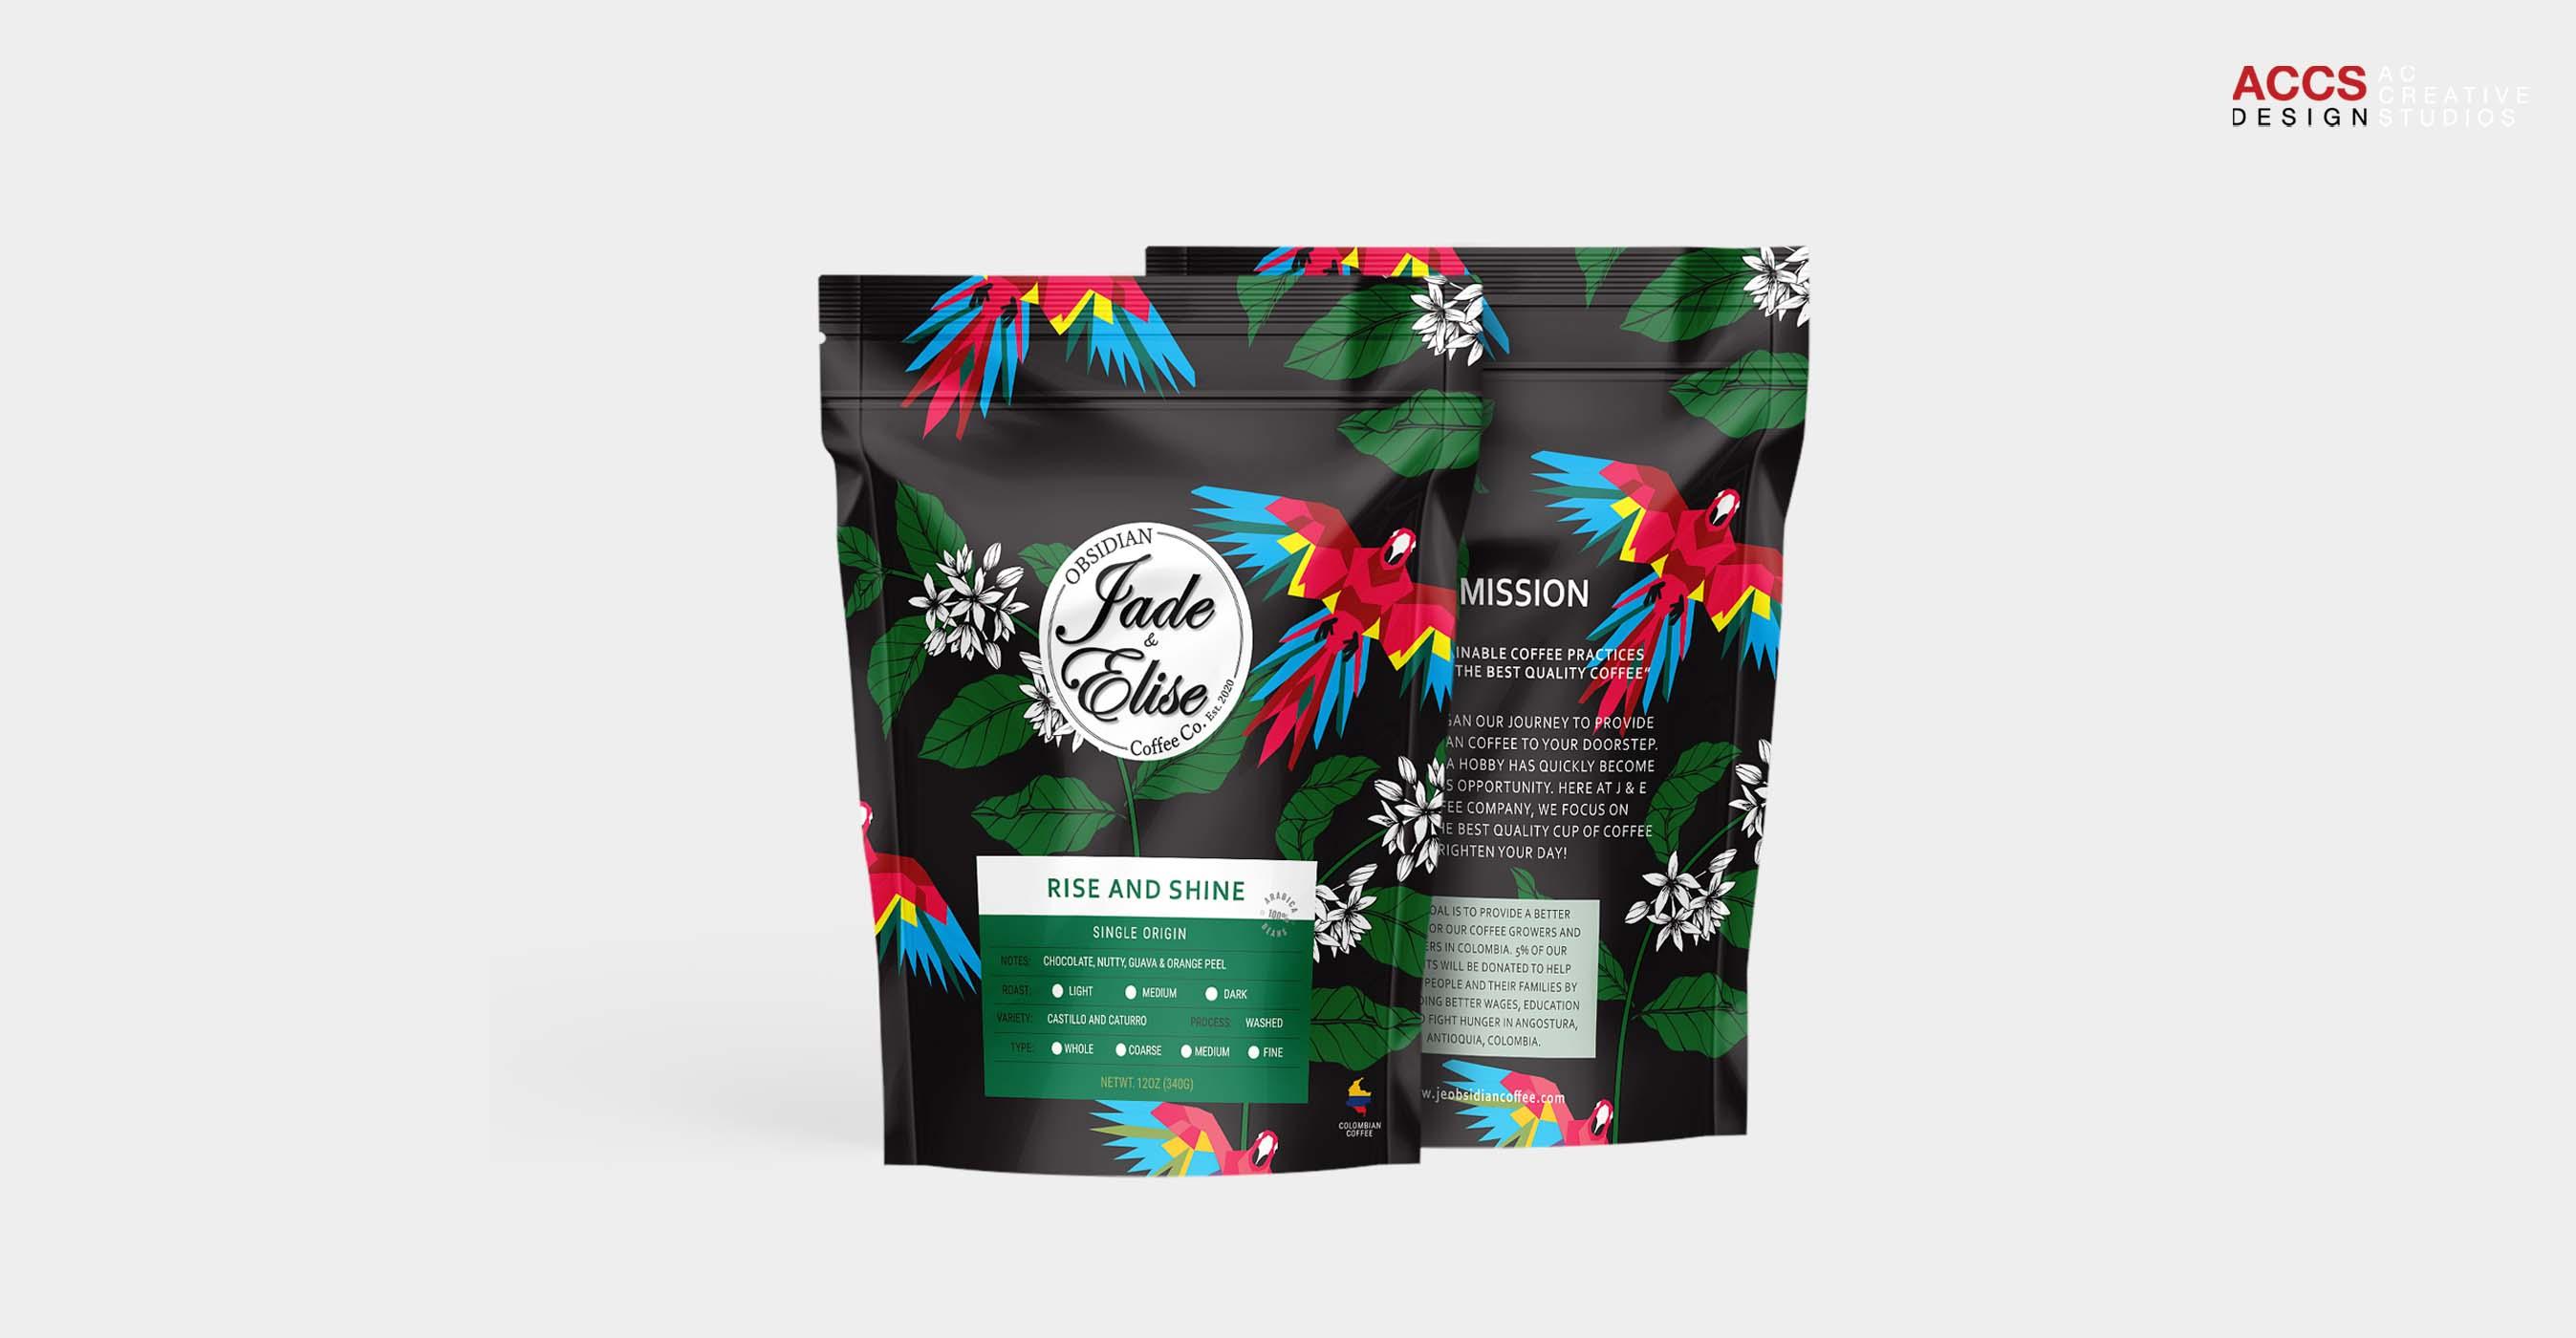 Jade and Elise Obsidian Coffee